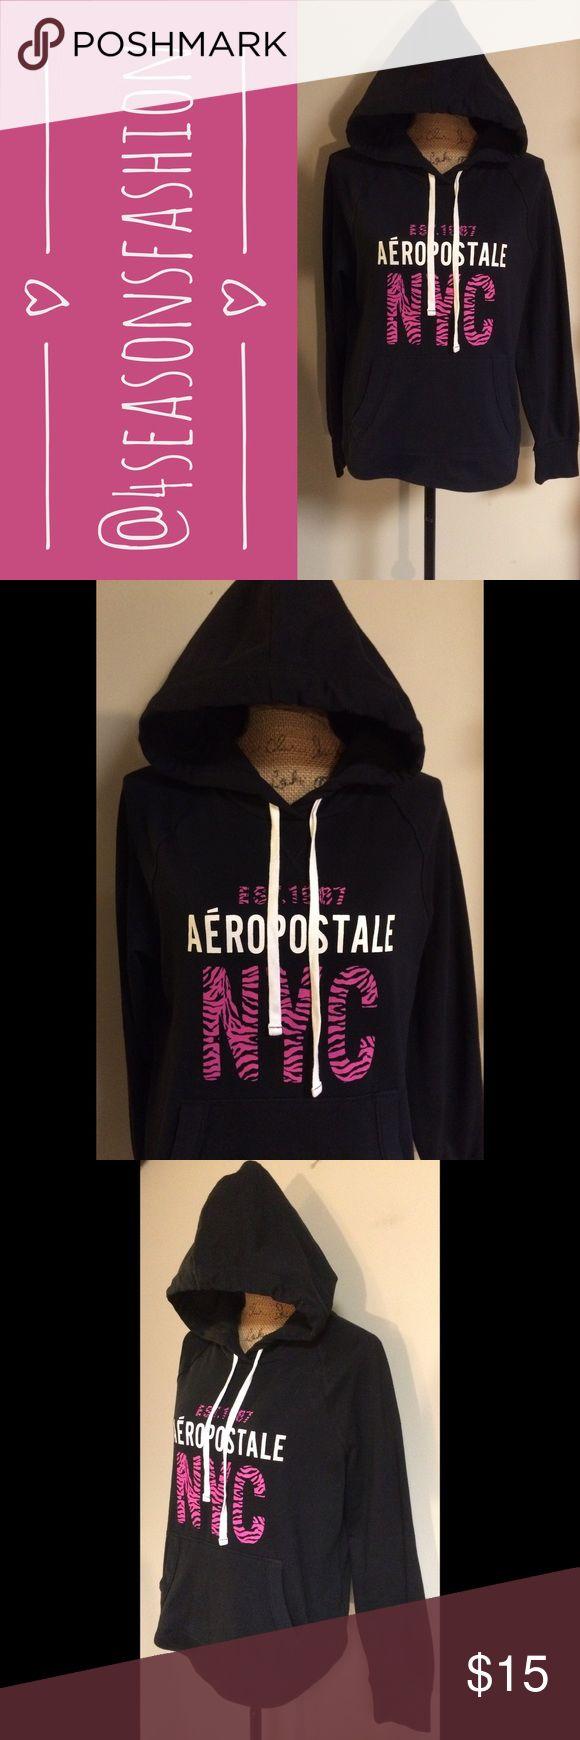 🎃BRAND NEW LISTING 🎃 AEROPOSTALE LONG SLEEVE THIN HOODIE IN LIKE NEW CONDITION SZ XL juniors. Aeropostale Tops Sweatshirts & Hoodies